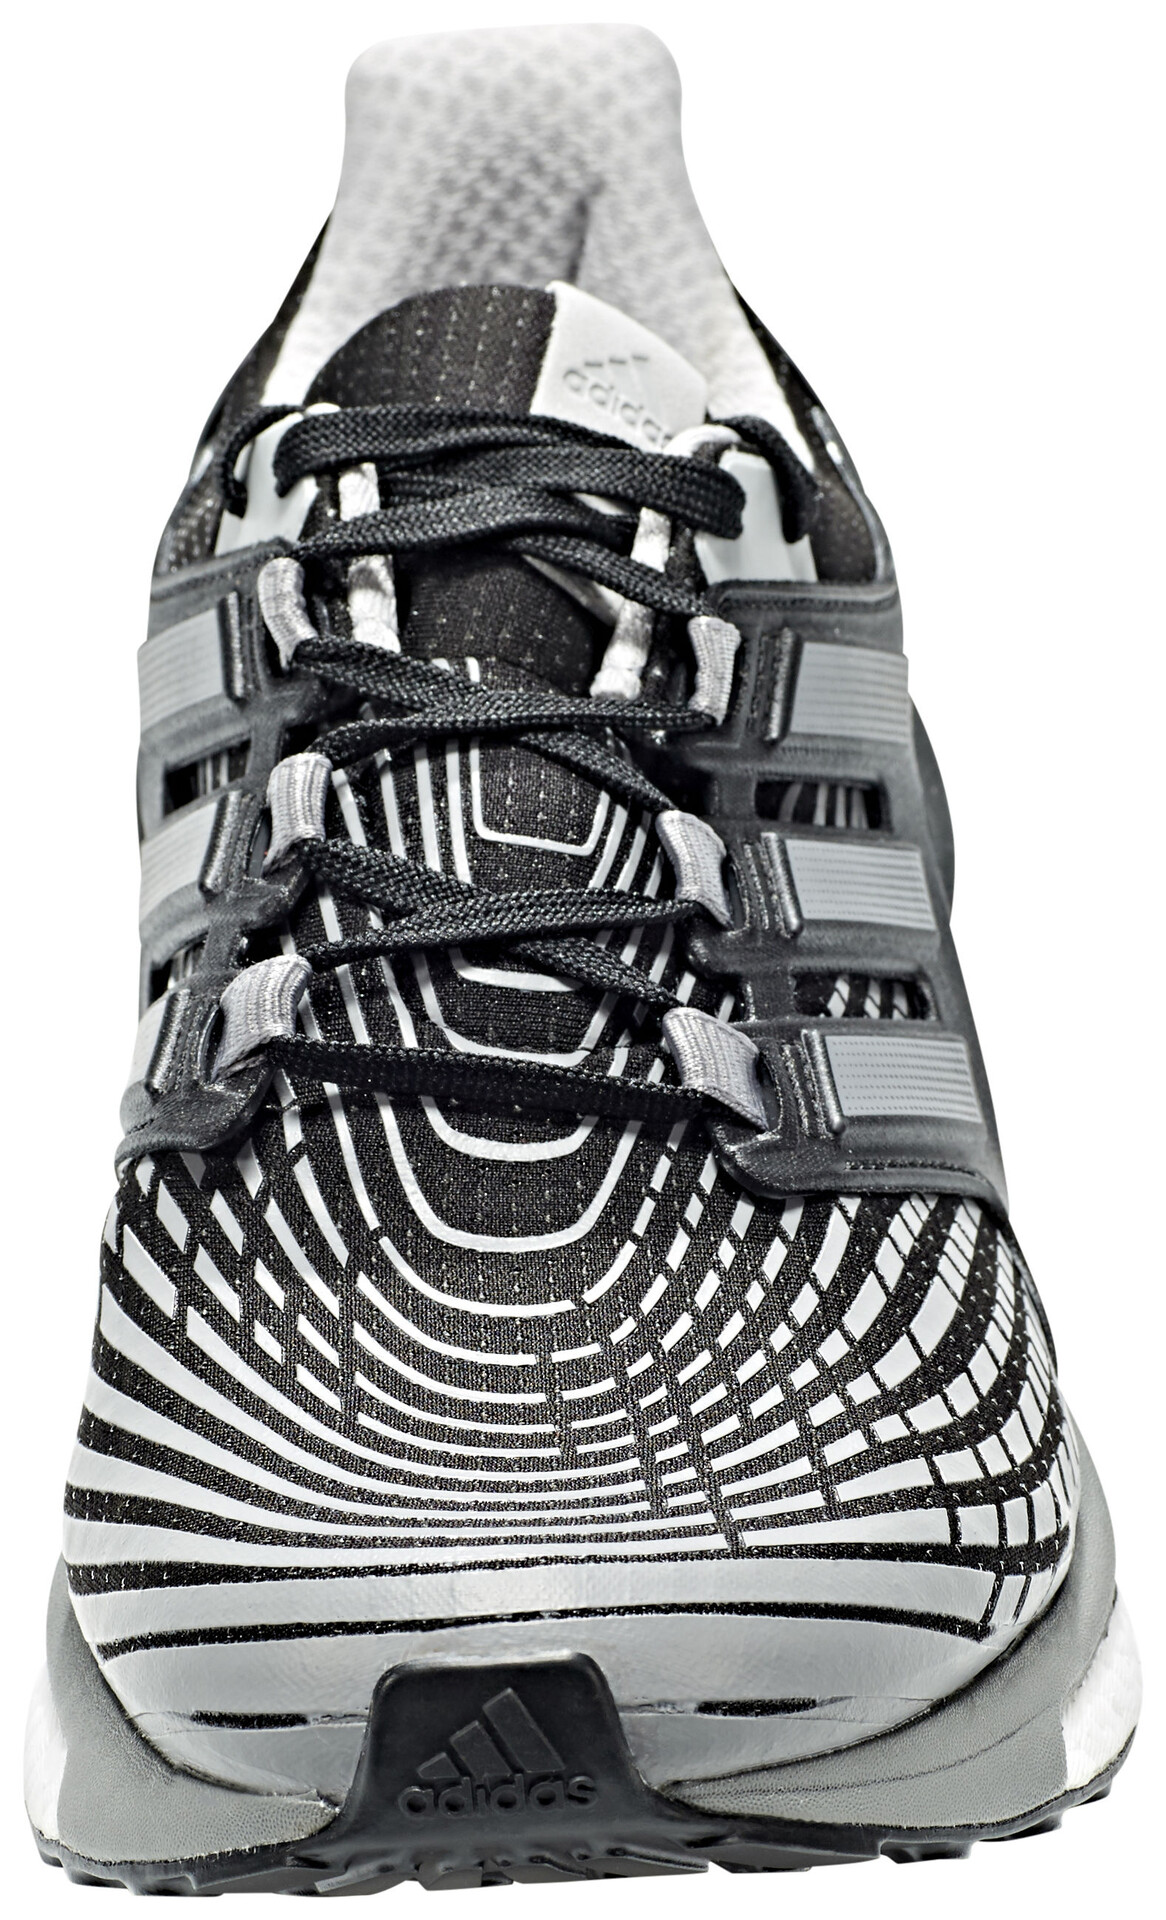 ae2fb3f8 ... greece where to buy adidas energy boost løpesko herre grå svart 3828a  b8263 05179 368d8